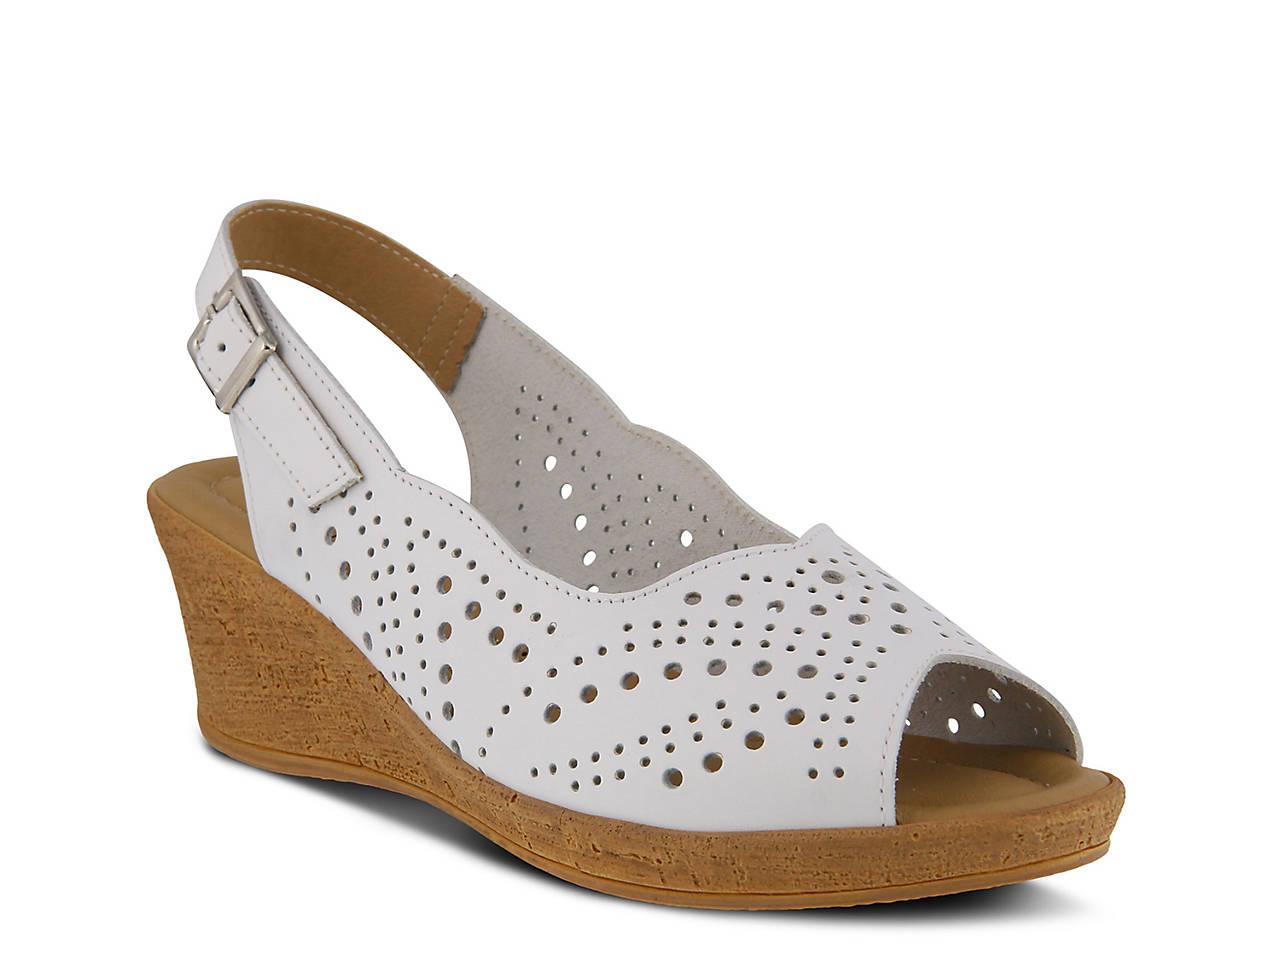 beb67232513 Trikala Wedge Sandal